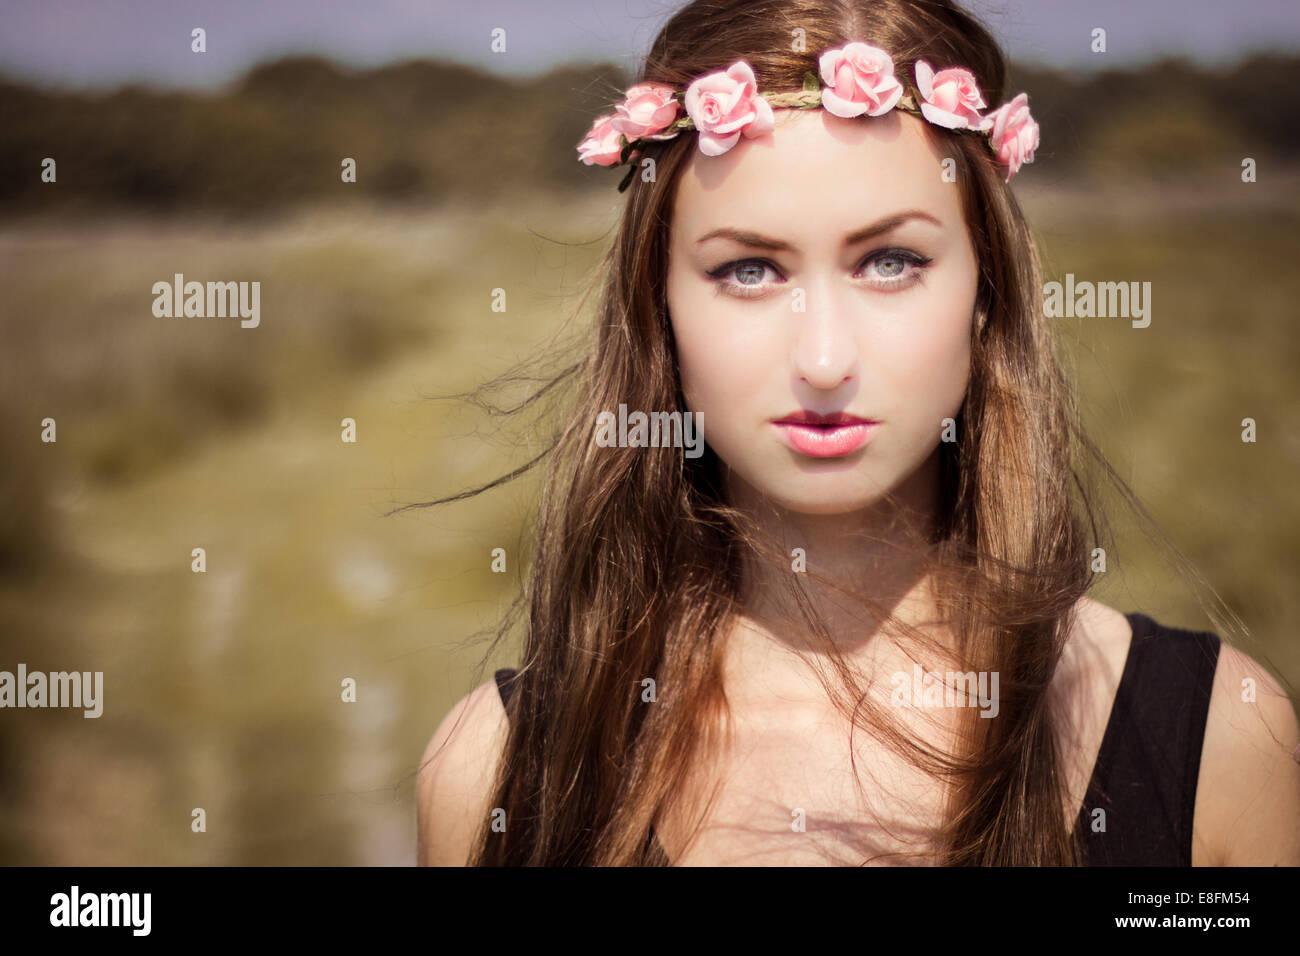 Holland, Netherlands Lovely Sunny Portrait - Stock Image